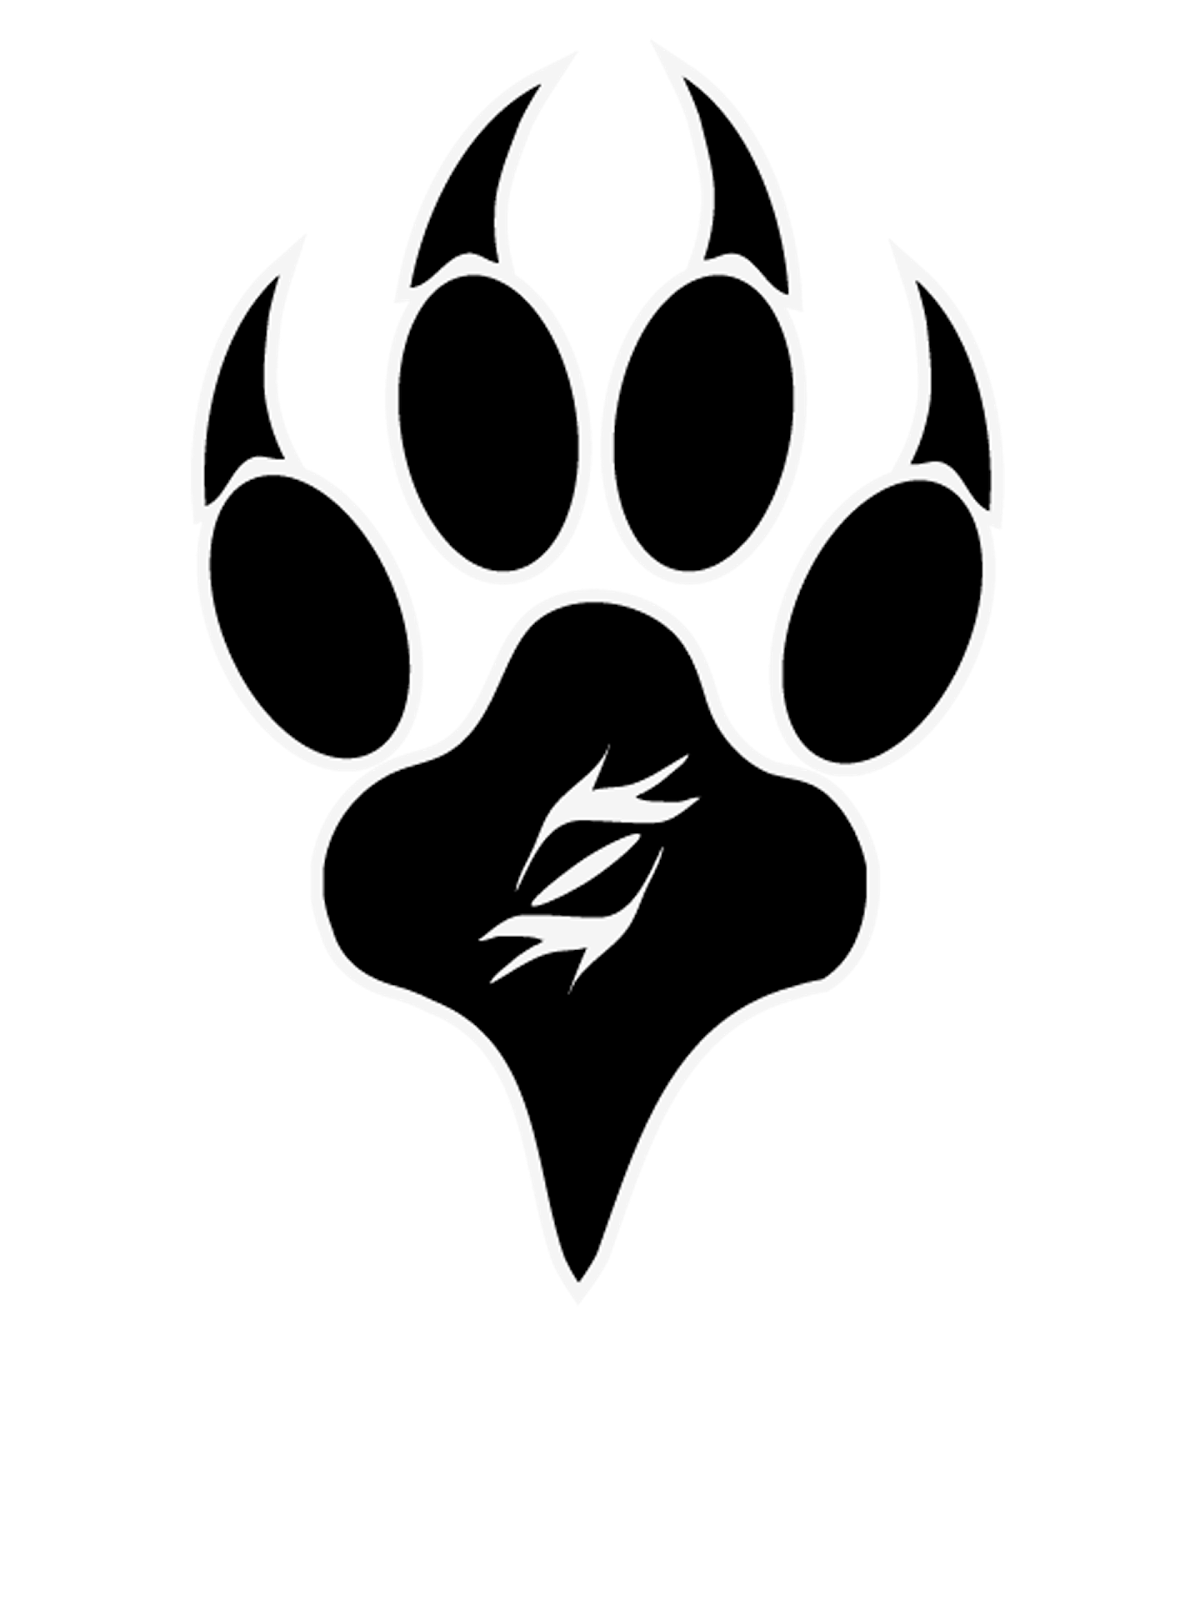 Wolf pack logo design - photo#11